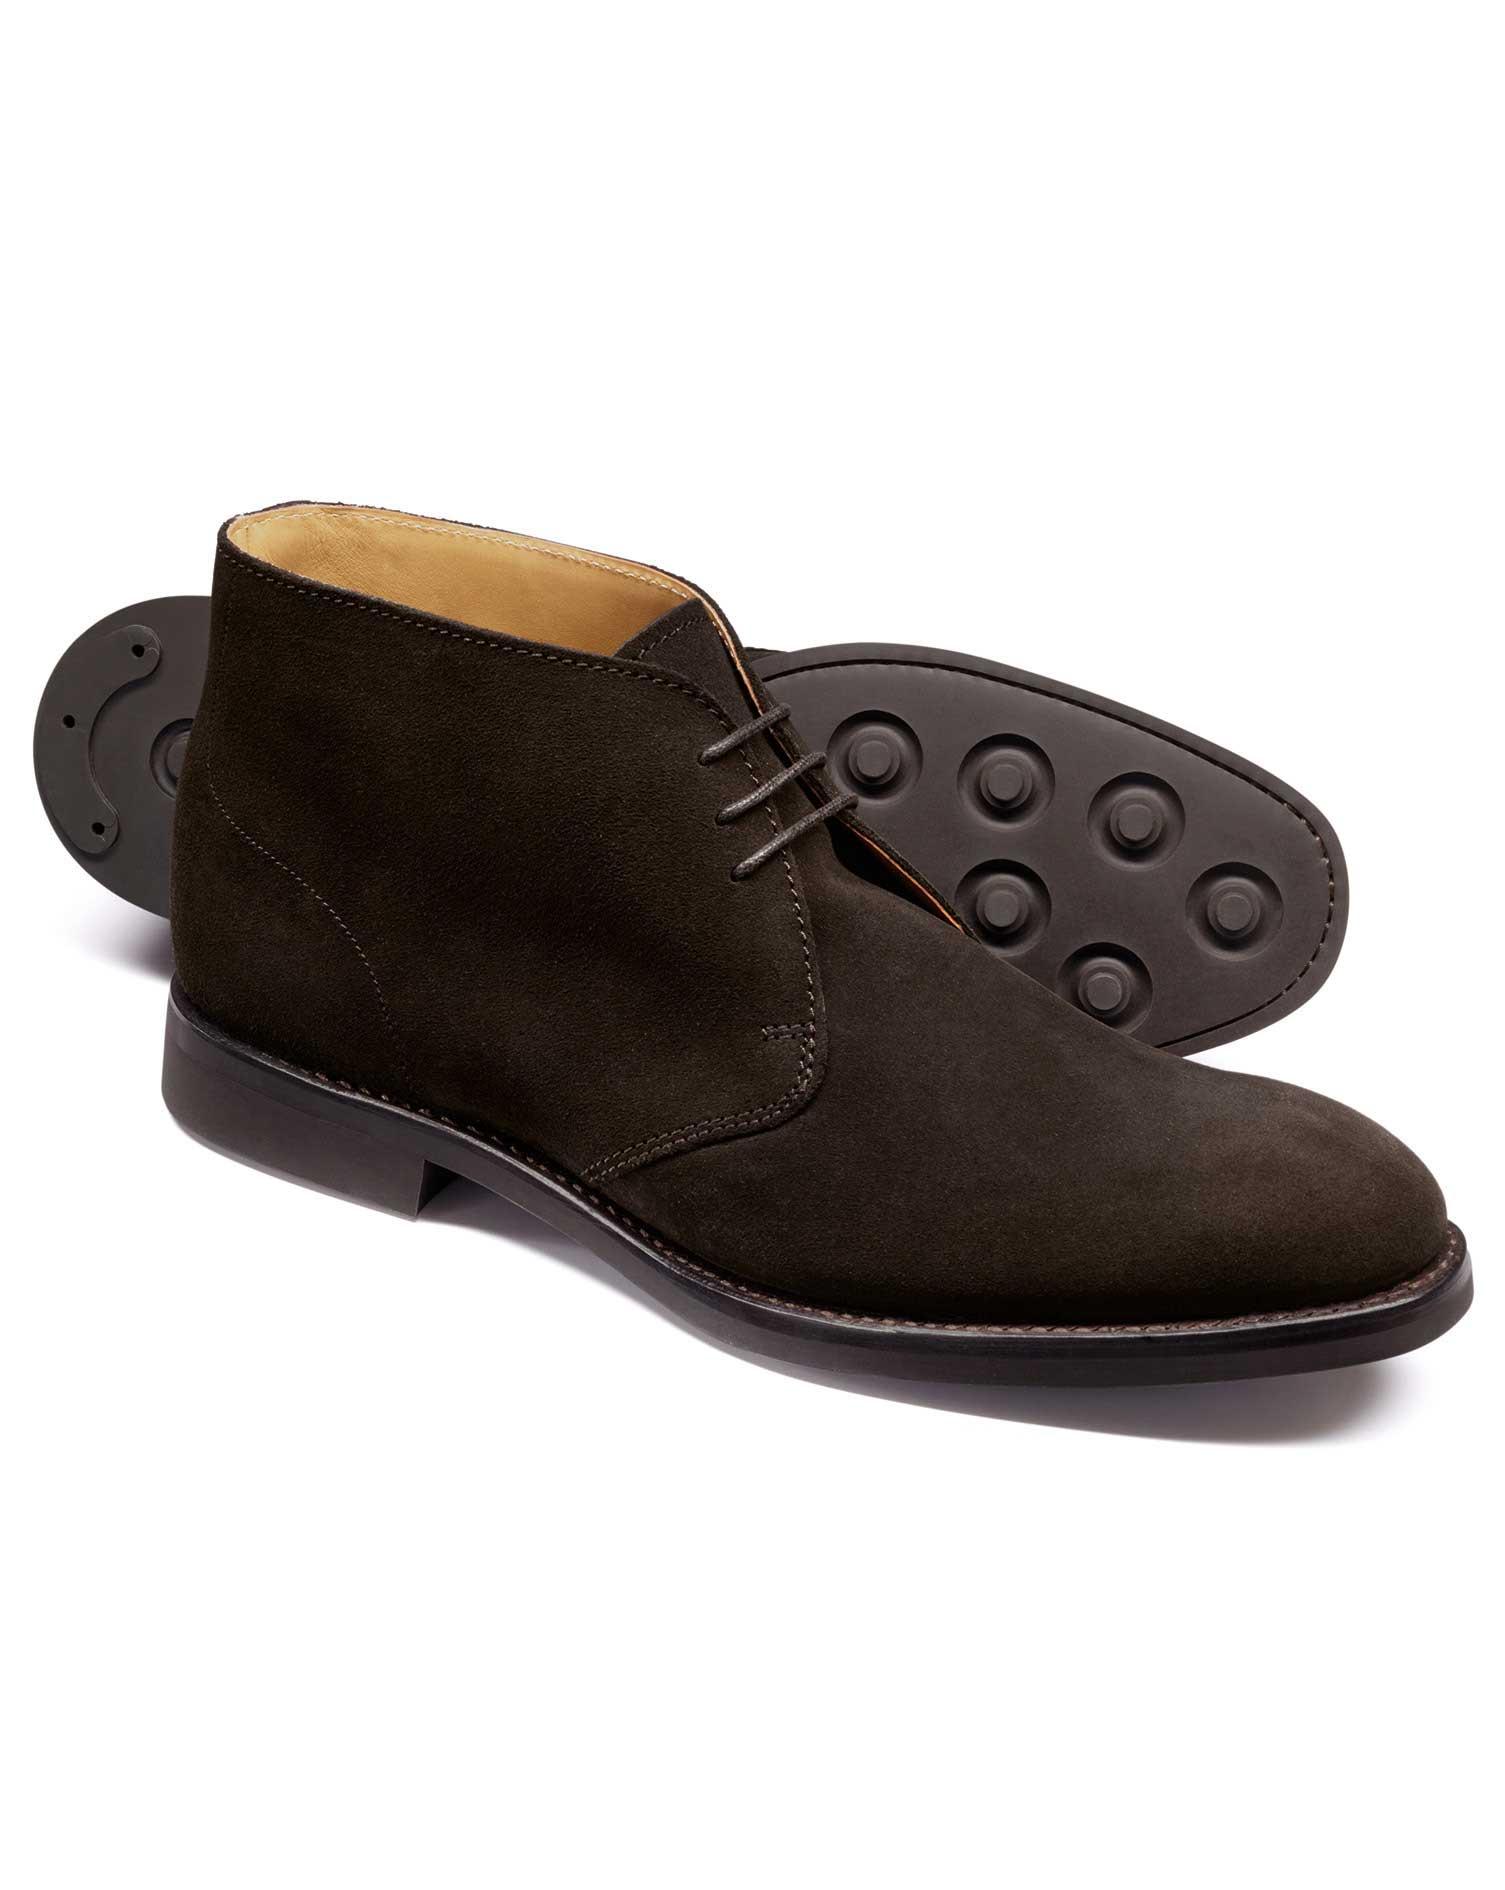 Dark Brown Suede Goodyear Welted Chukka Boots Charles Tyrwhitt